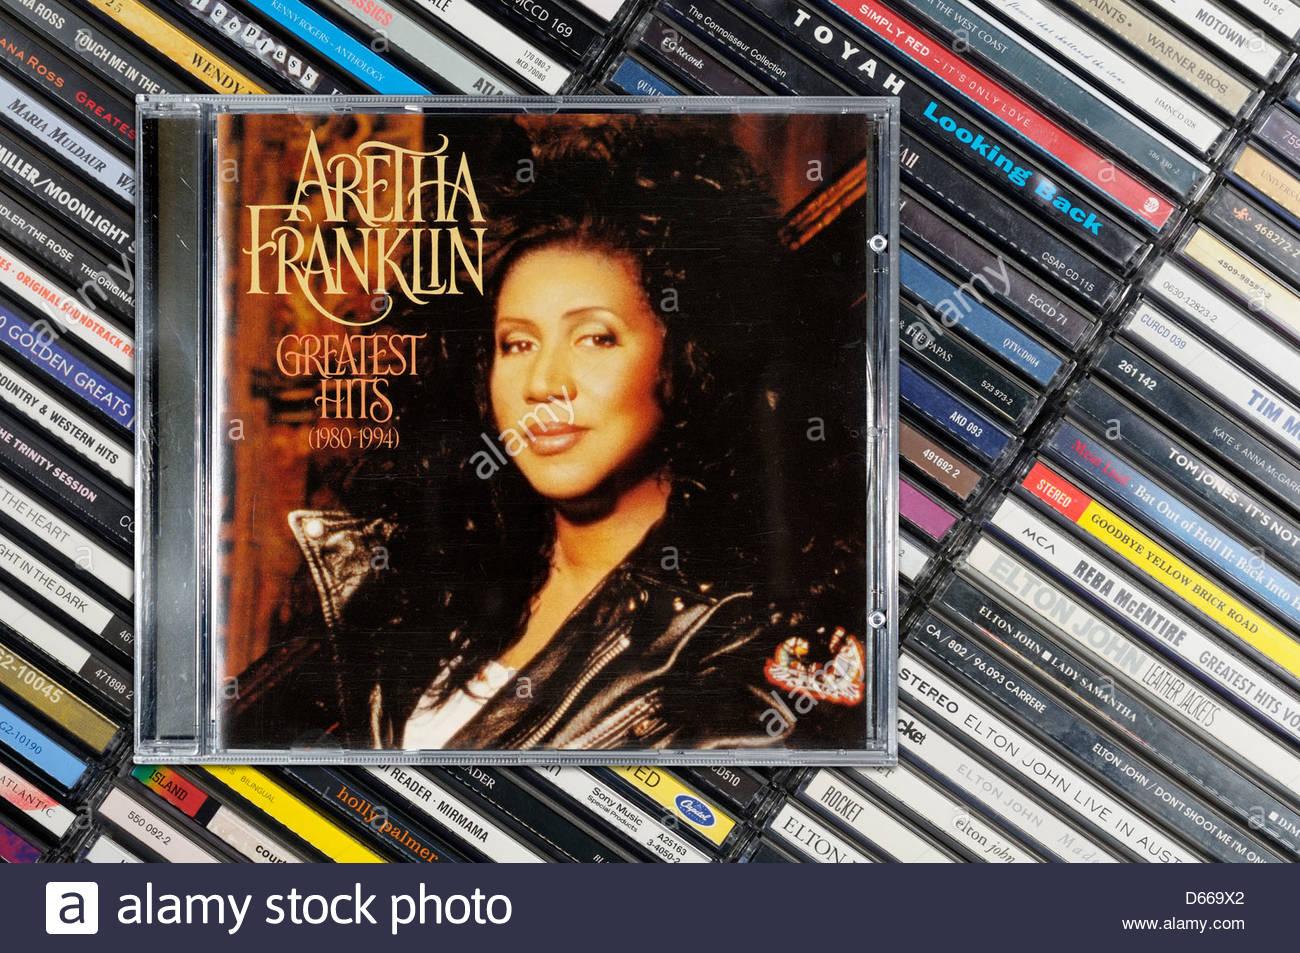 Aretha Franklin greatest hits Album, aufgetürmt Musik CD-Hüllen, England Stockfoto